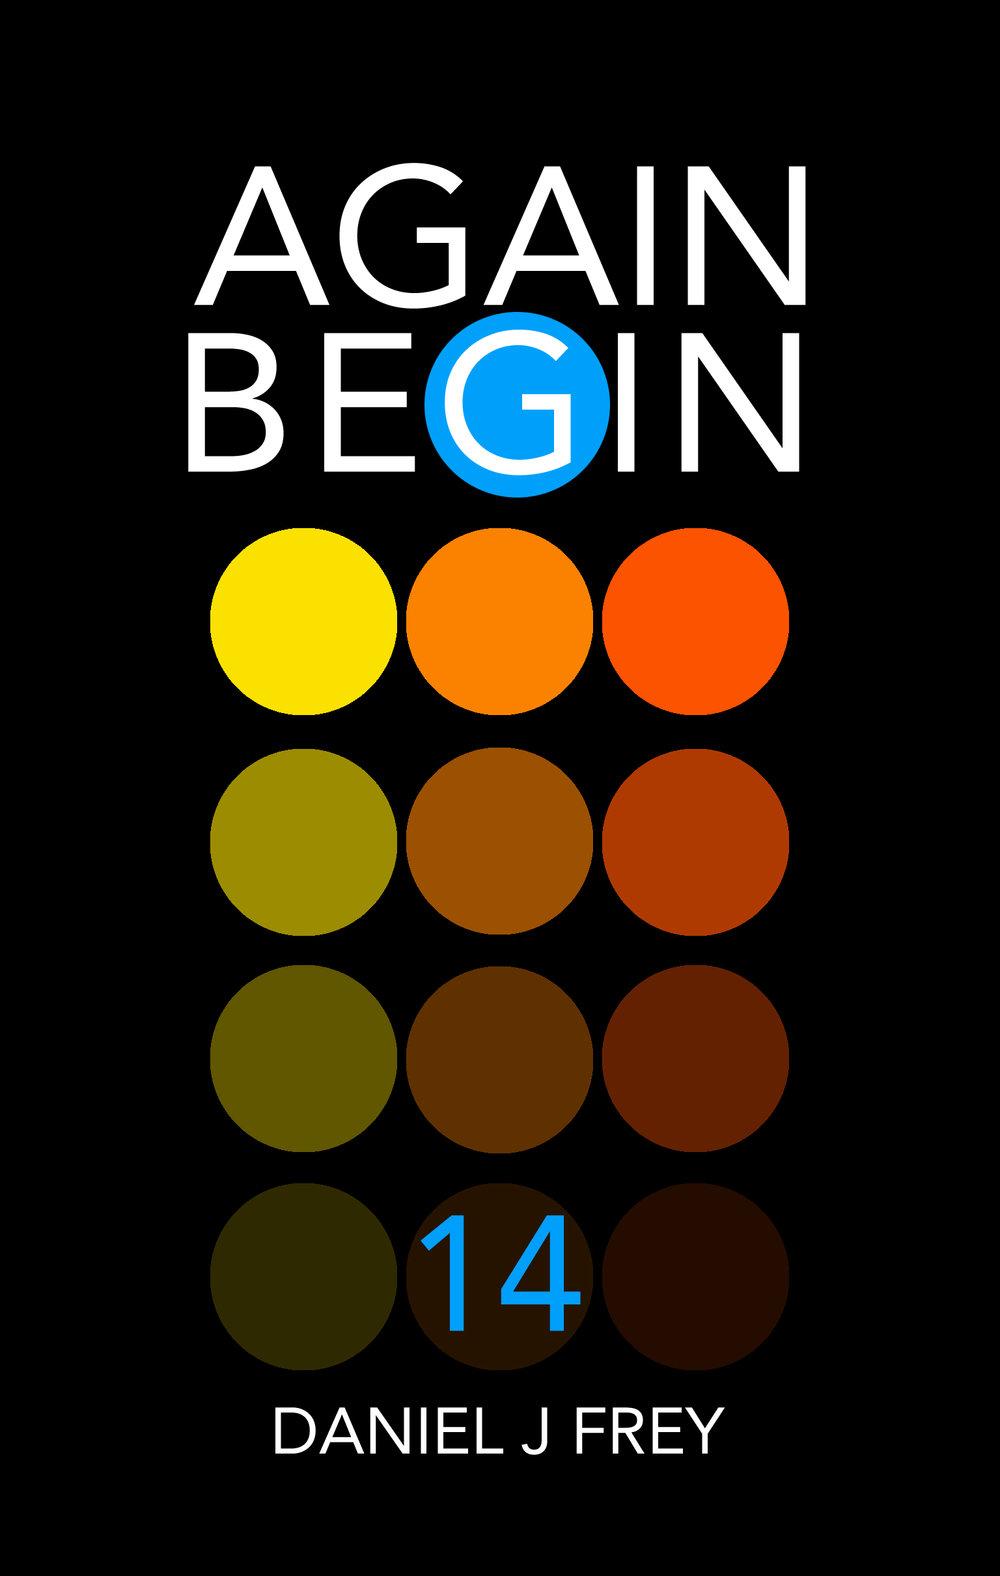 Again Begin - 14 It All Stops